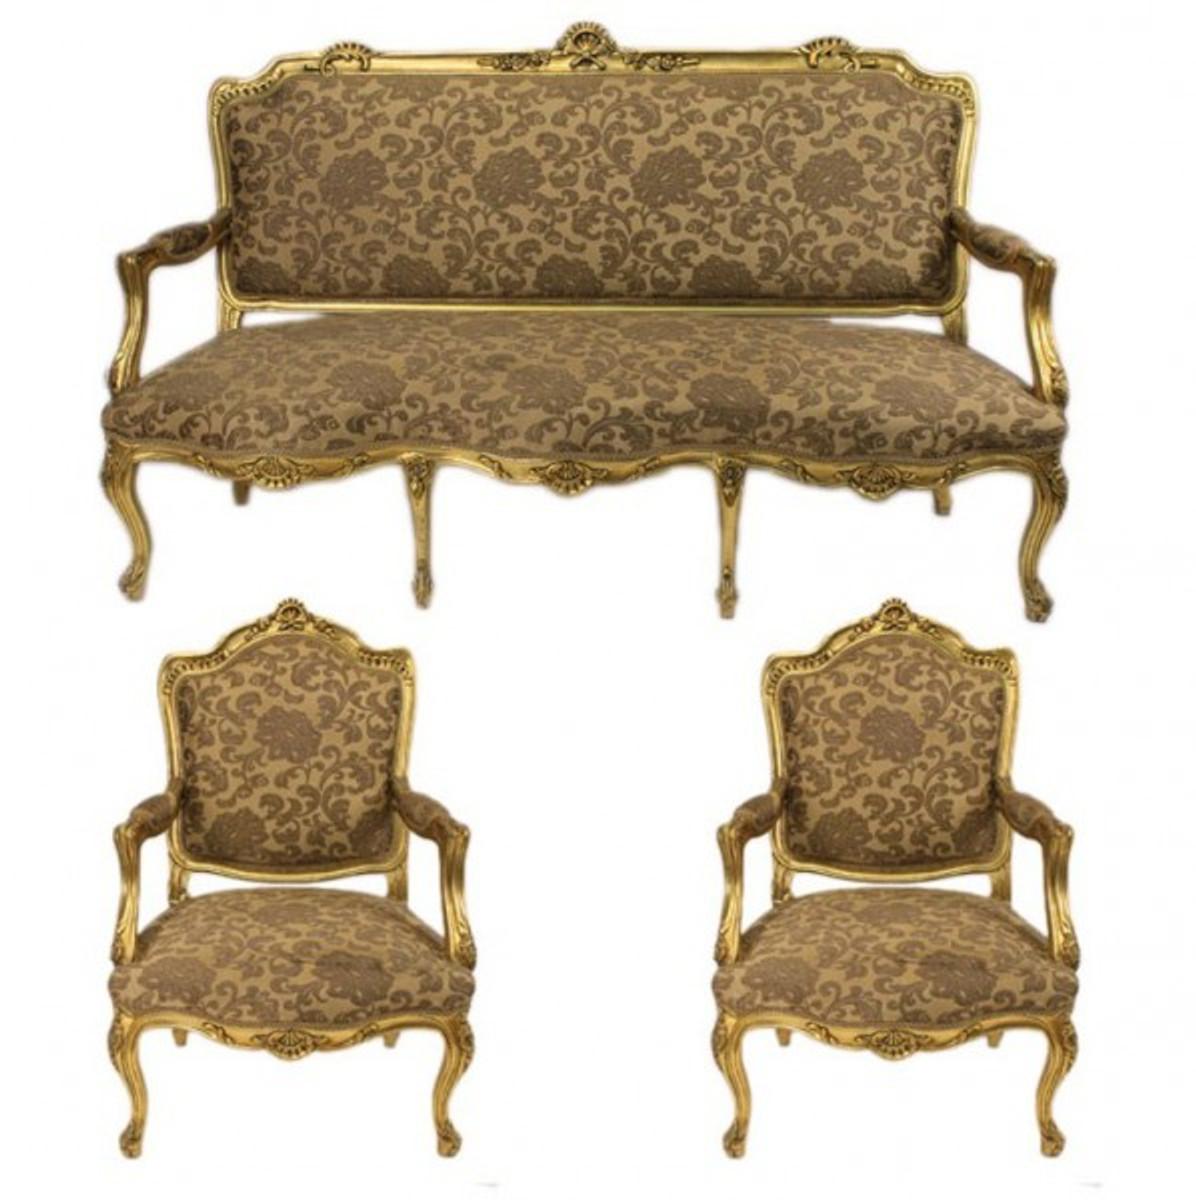 Casa Padrino Barock Wohnzimmer Set Strassbourg Gold Muster / Antik Stil  Gold   Sofa + 2 Sessel